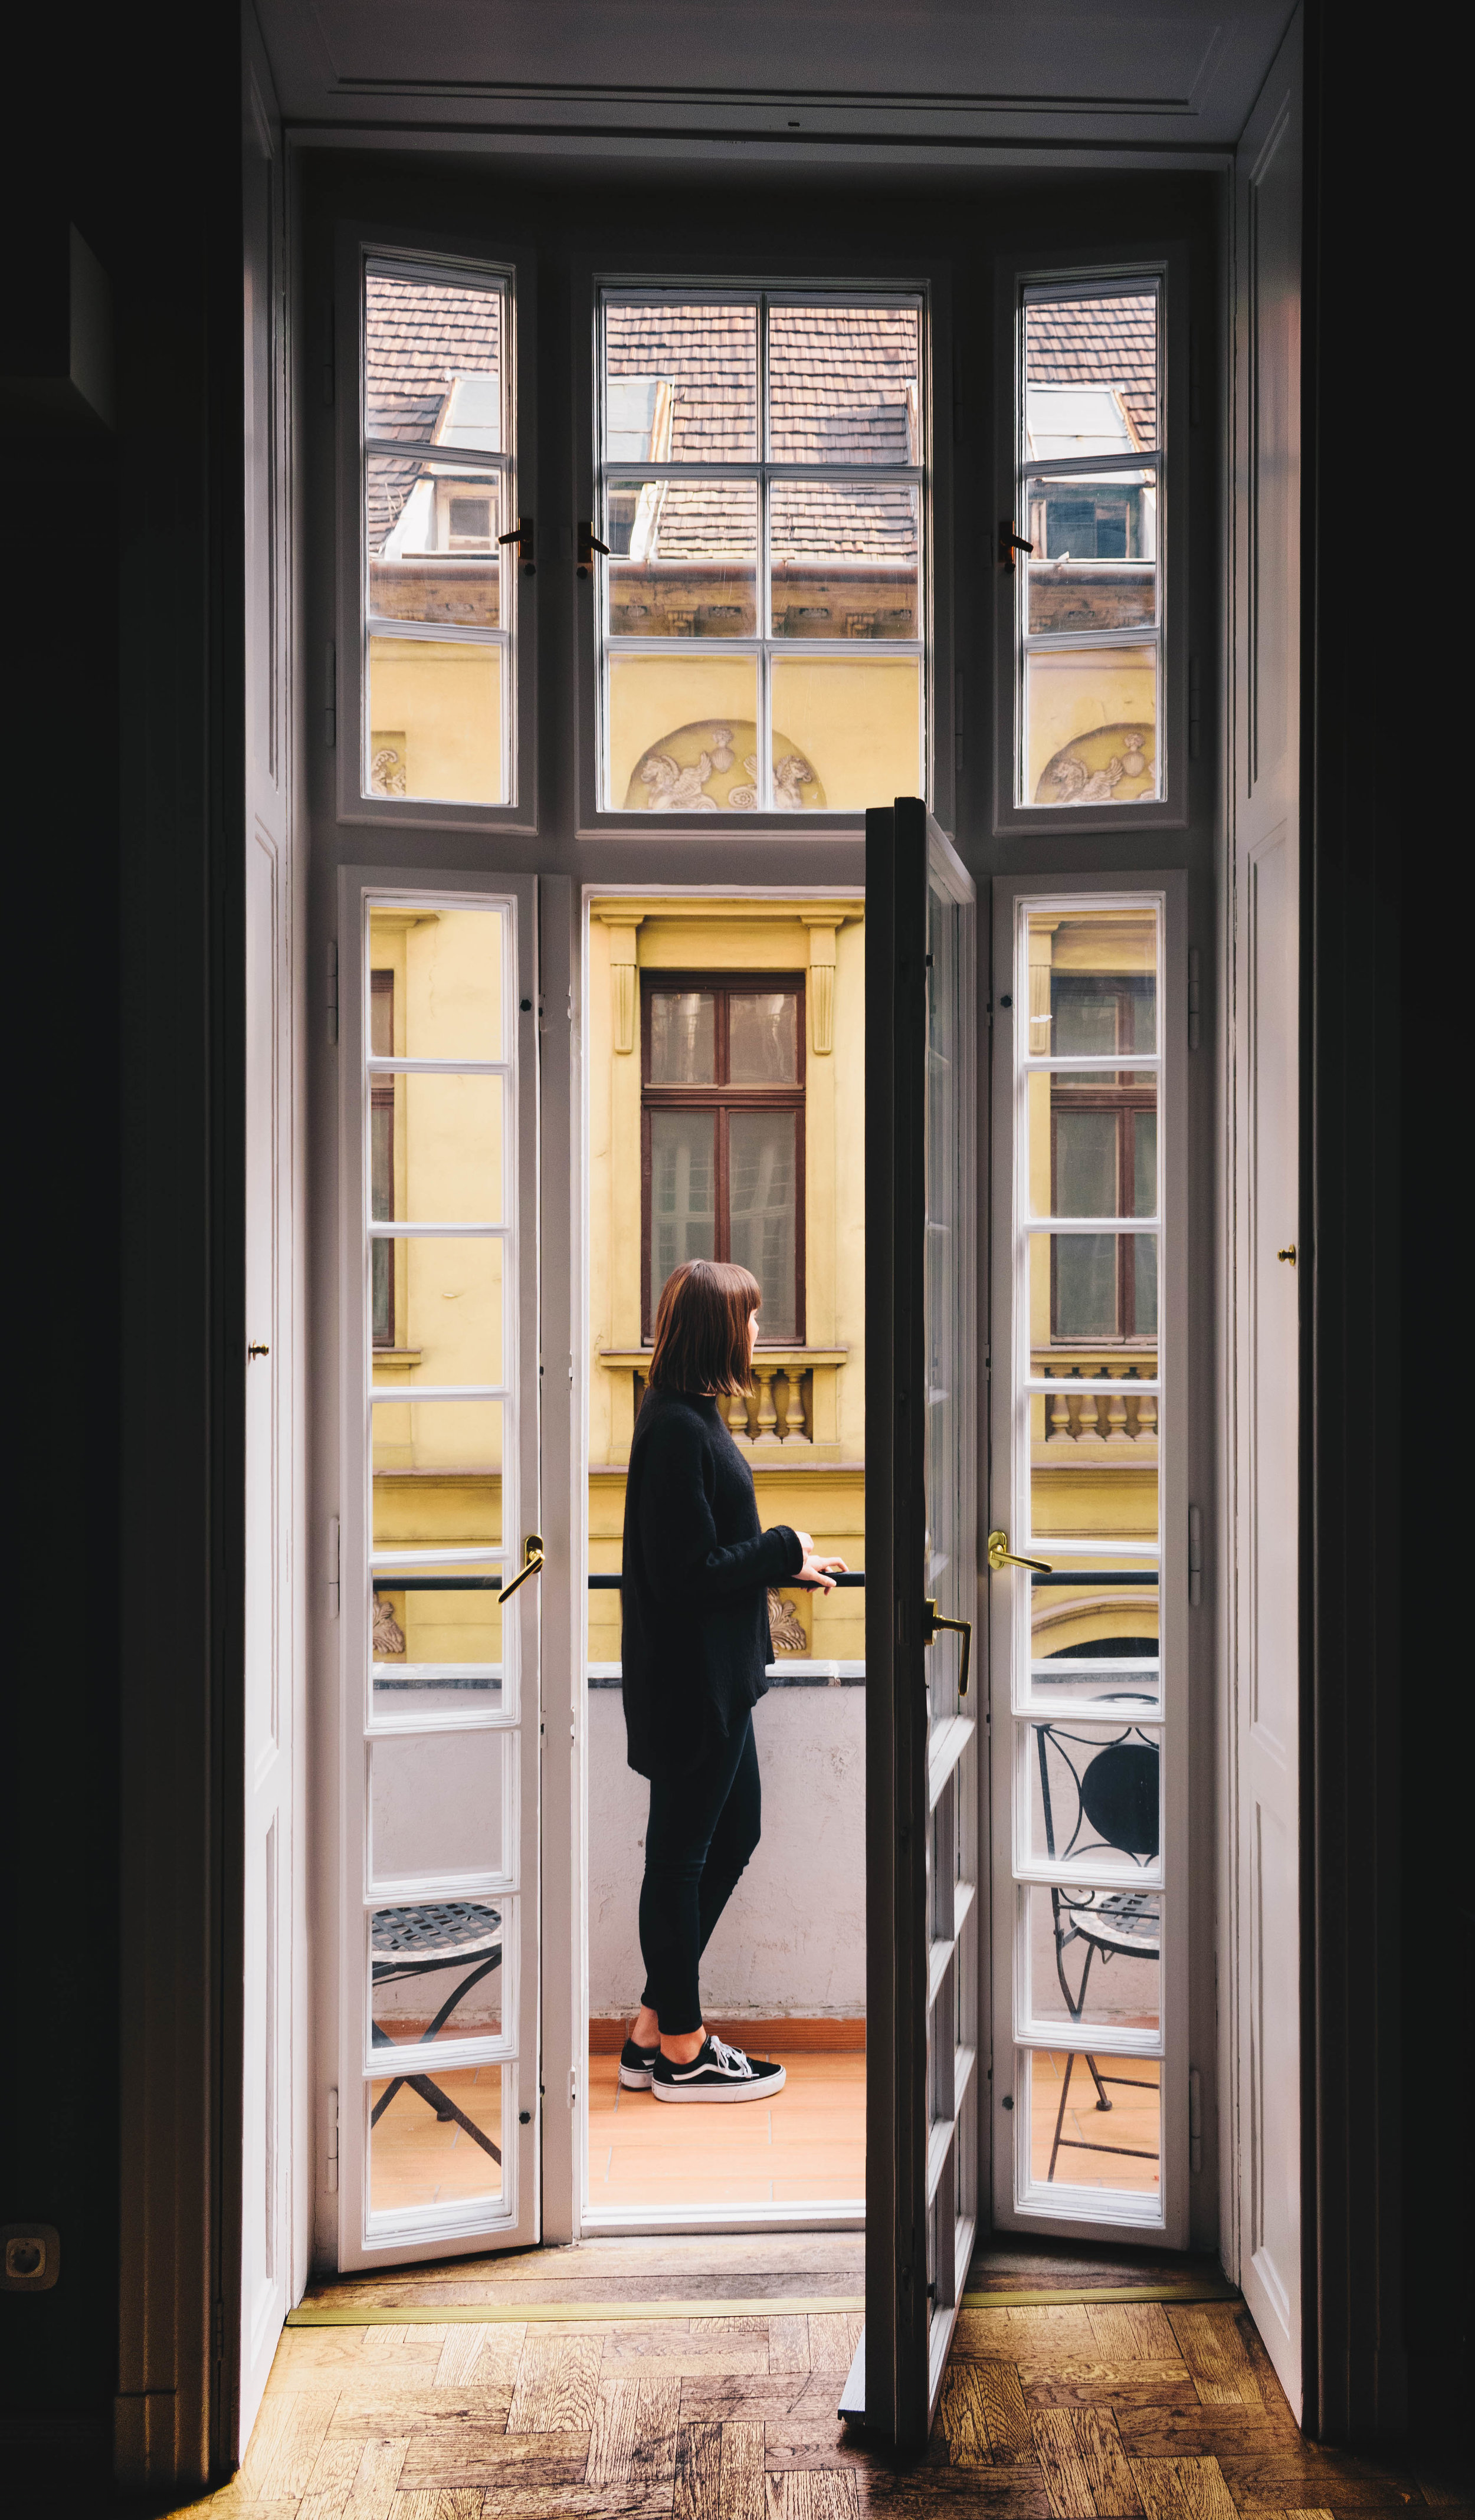 Budapest photography Sabina Woller Schmitz-0013.jpg